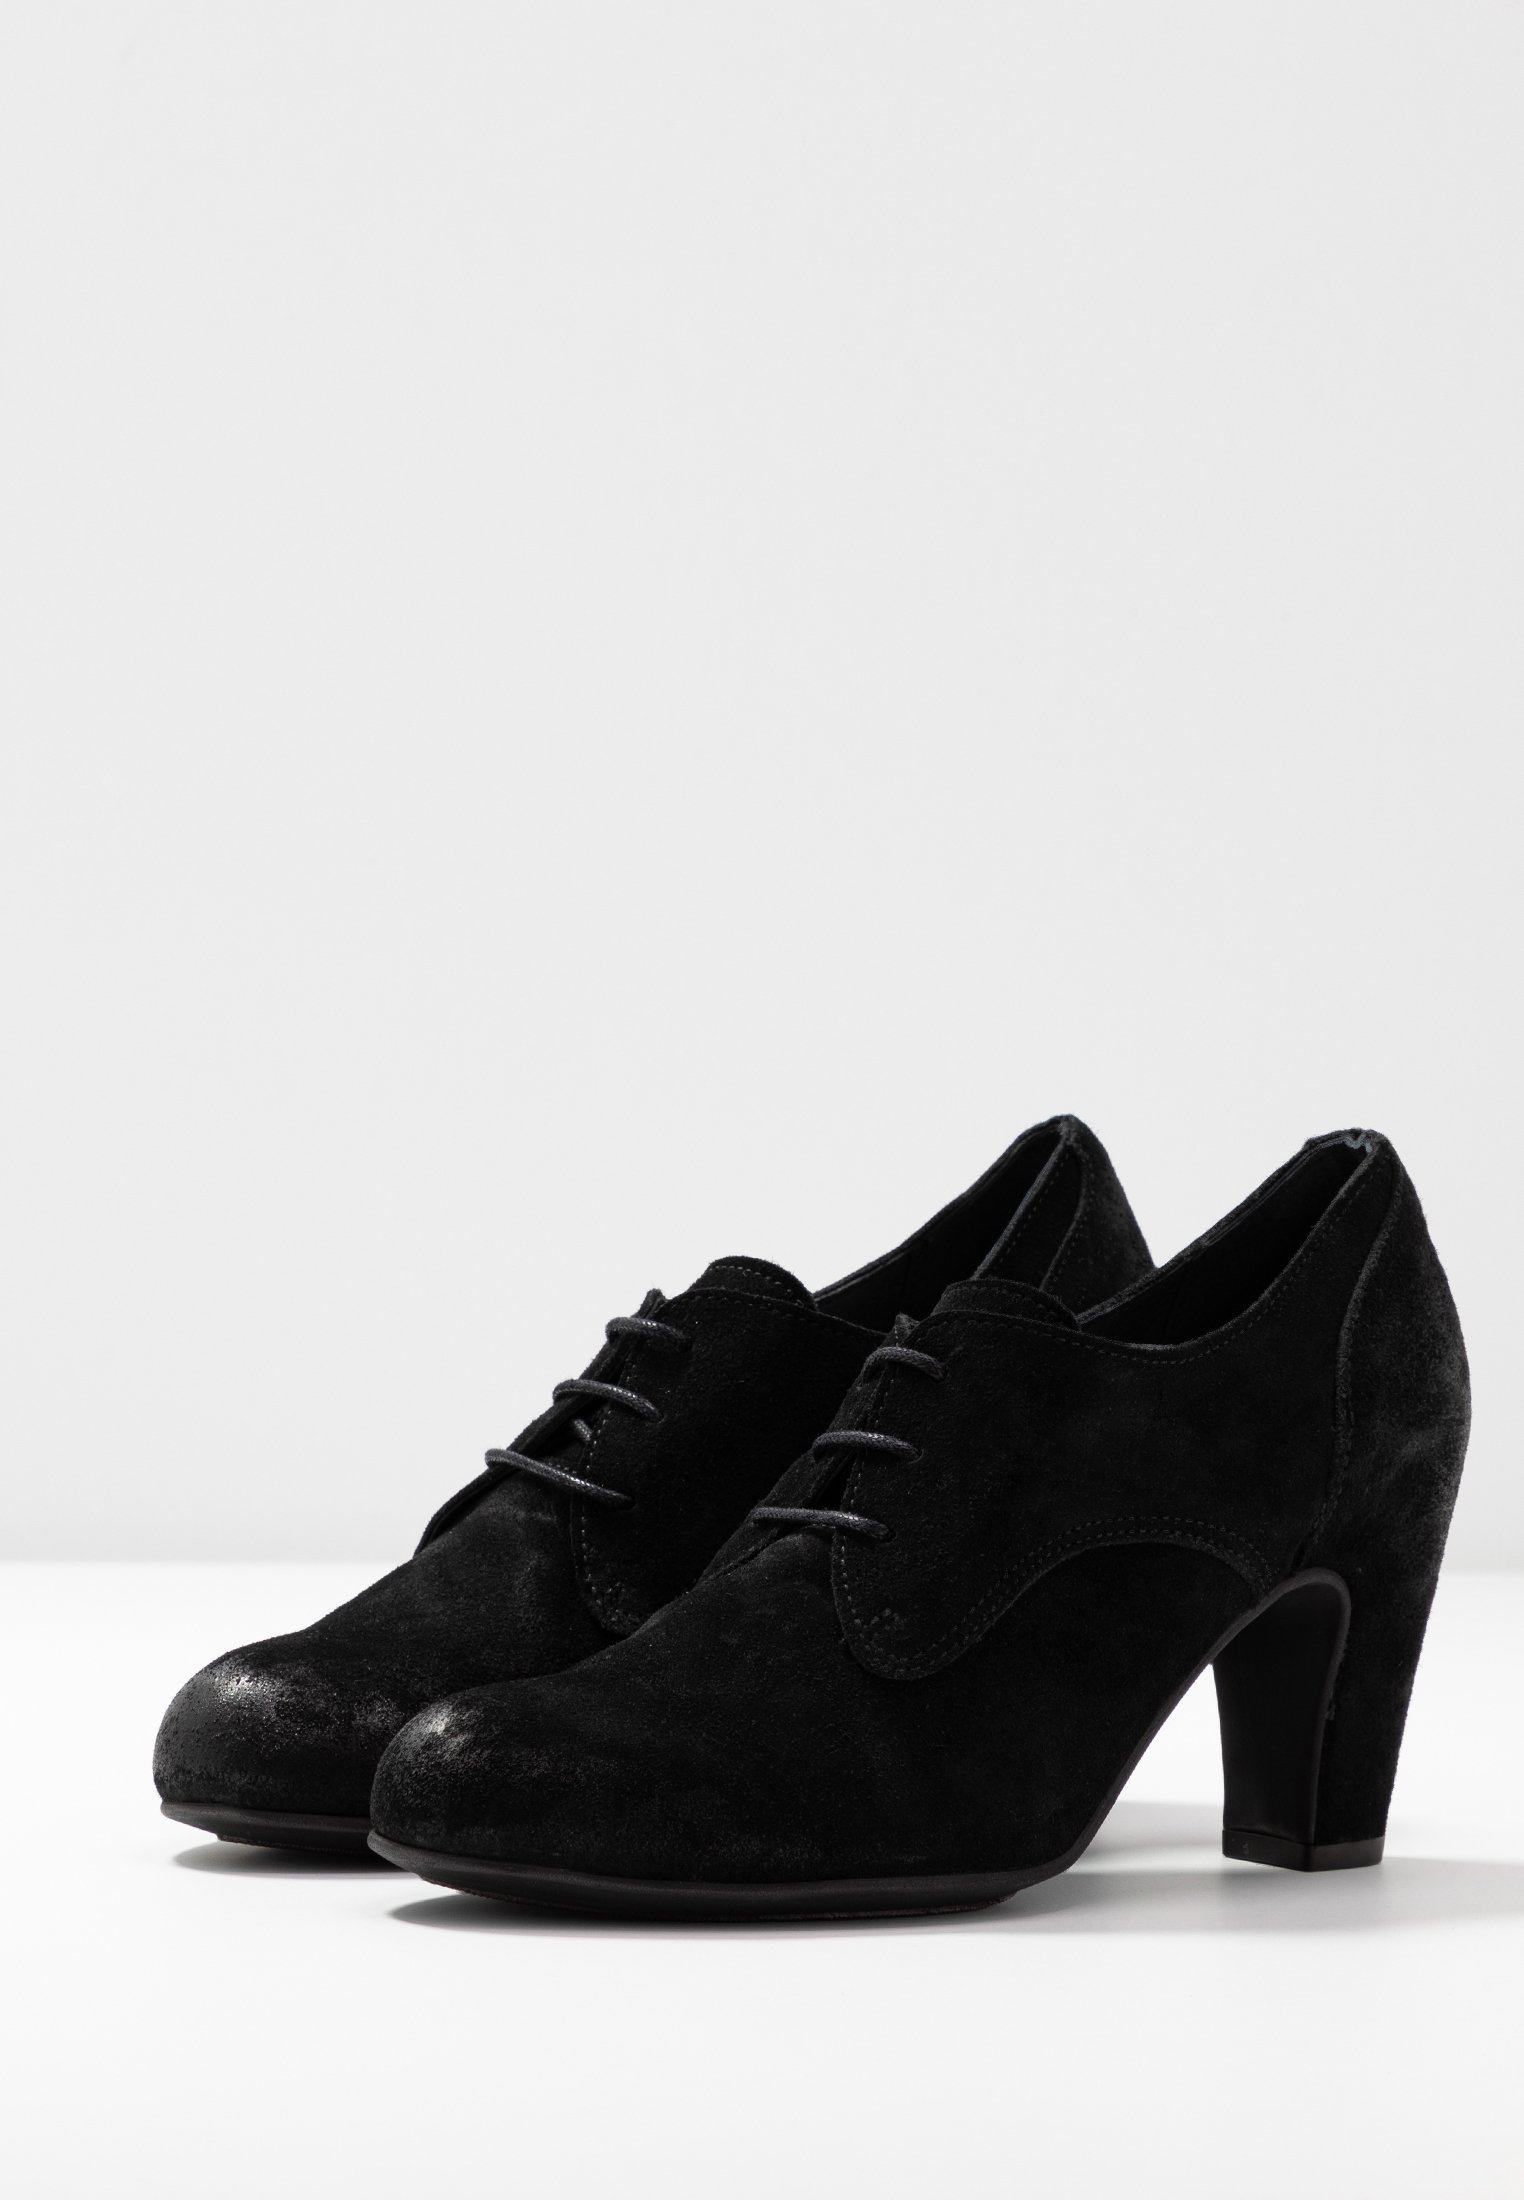 Felmini Wilma - Ankelstøvler Black